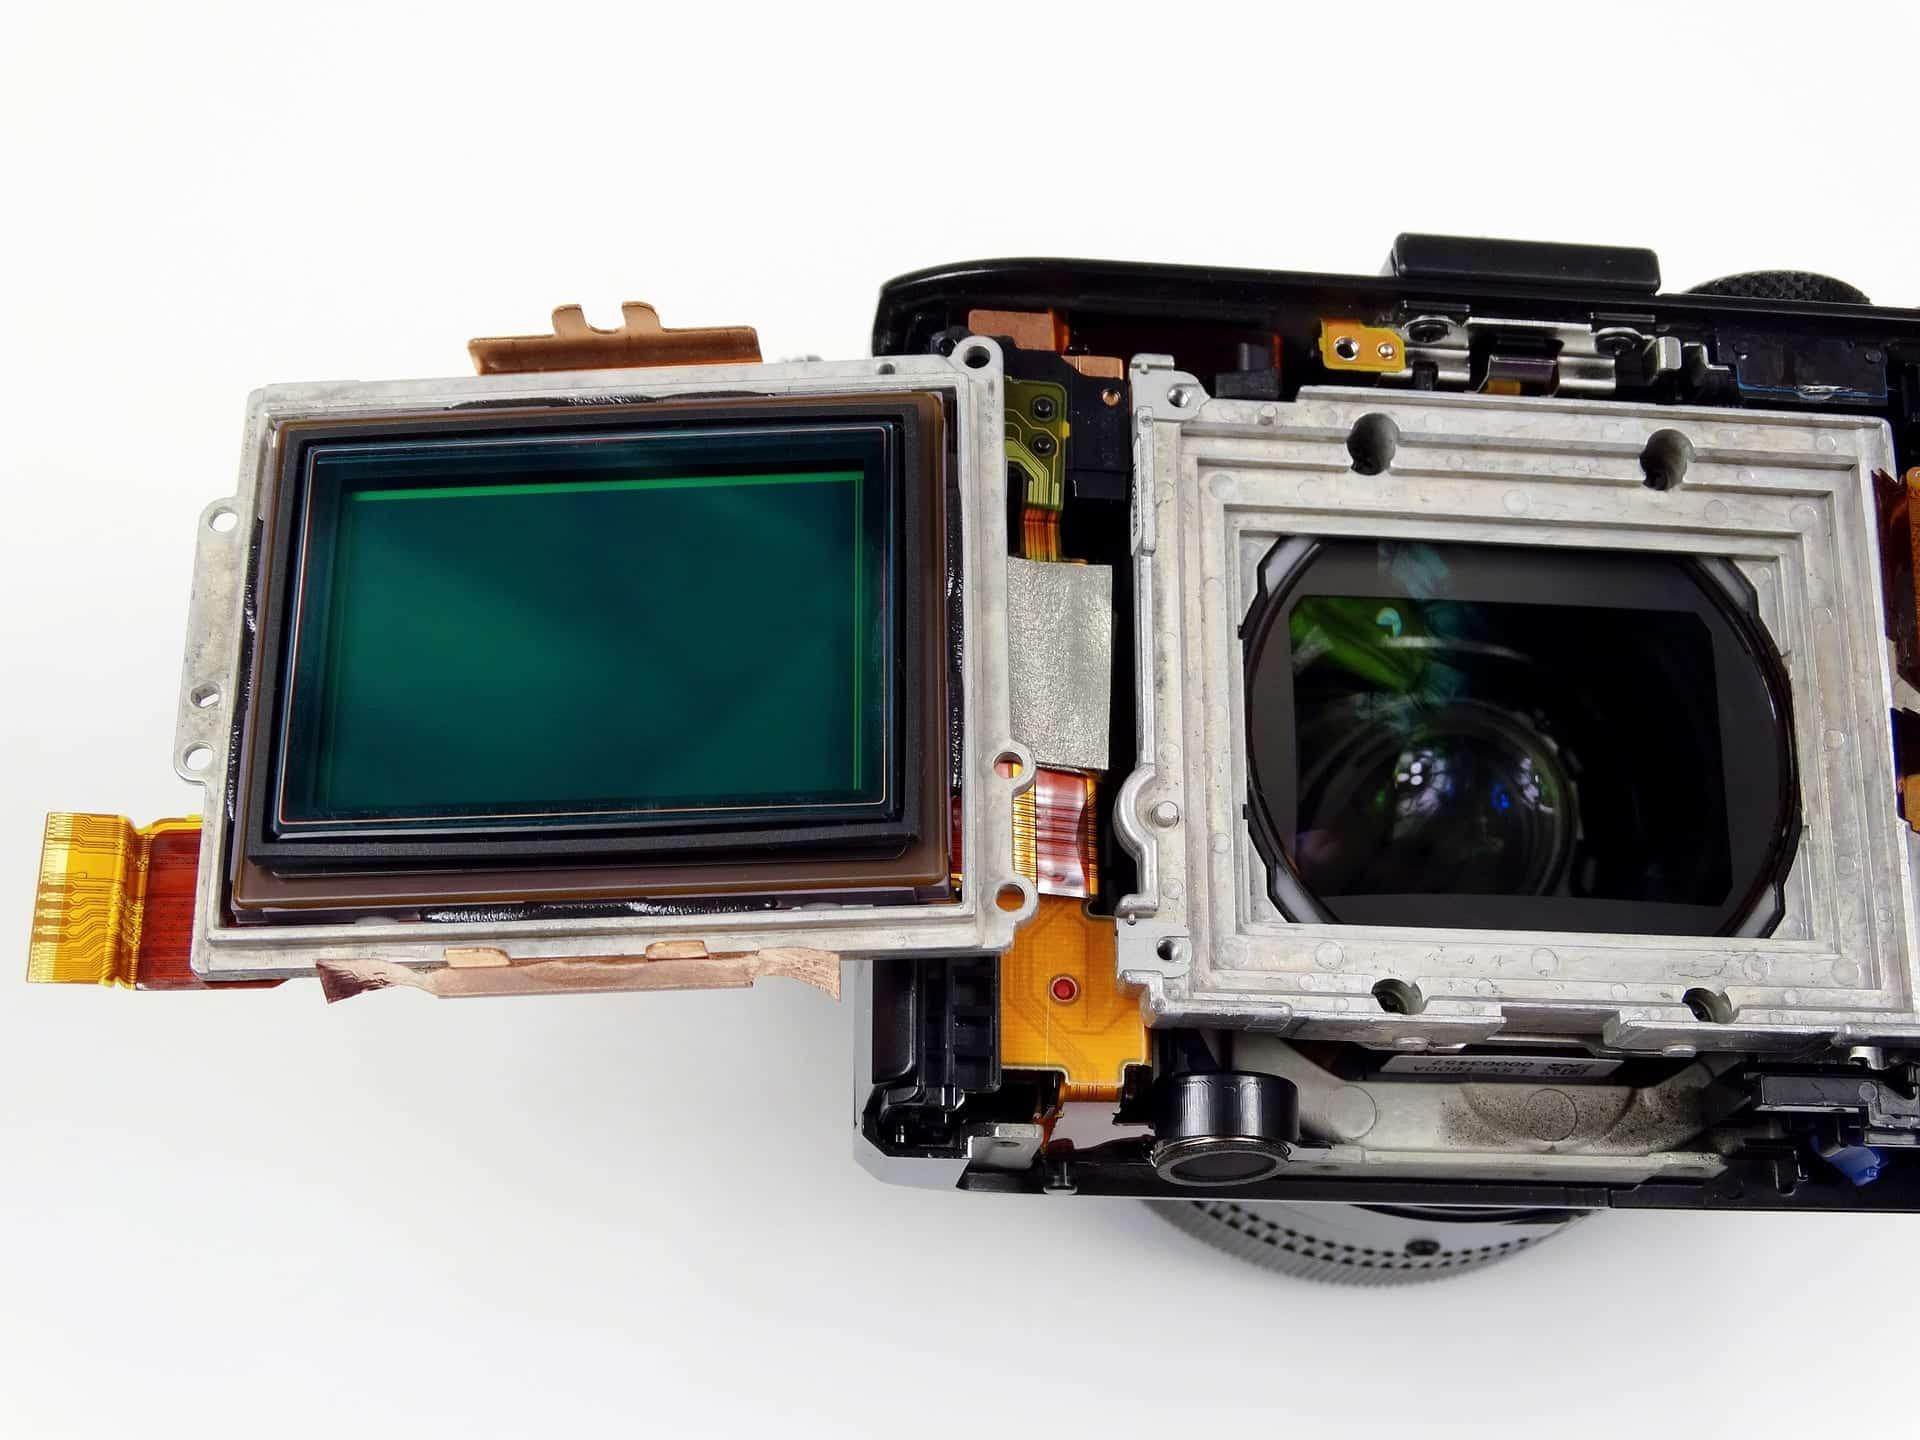 Kamera mit offengelegten Sensor